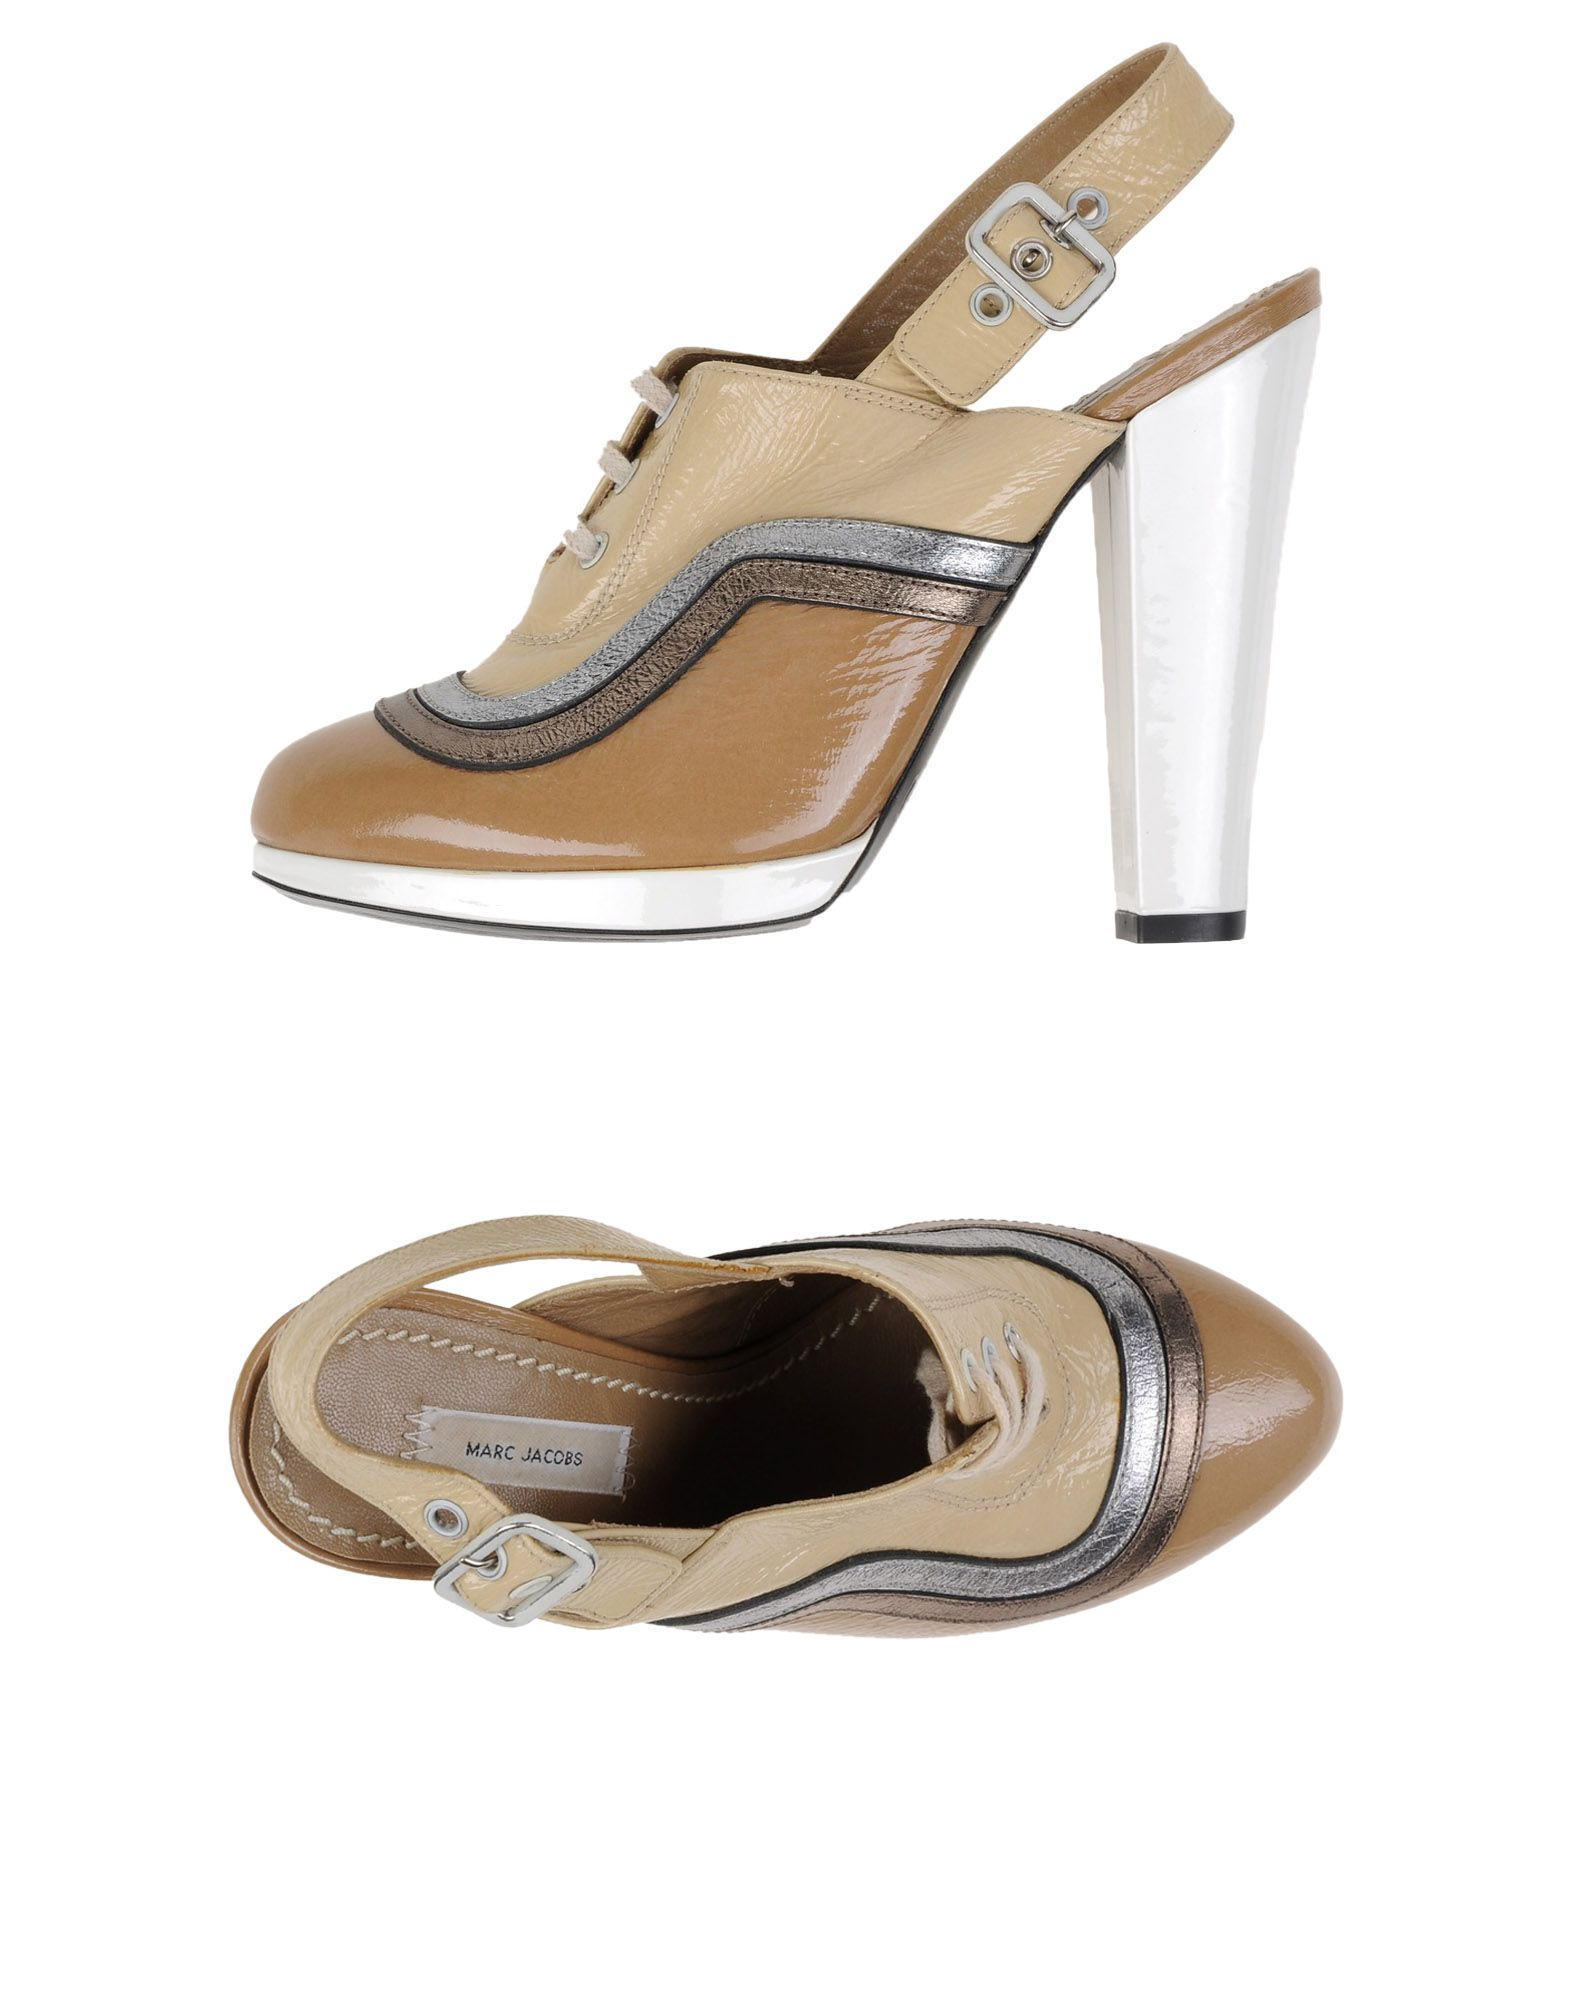 marc jacobs female marc jacobs laceup shoes